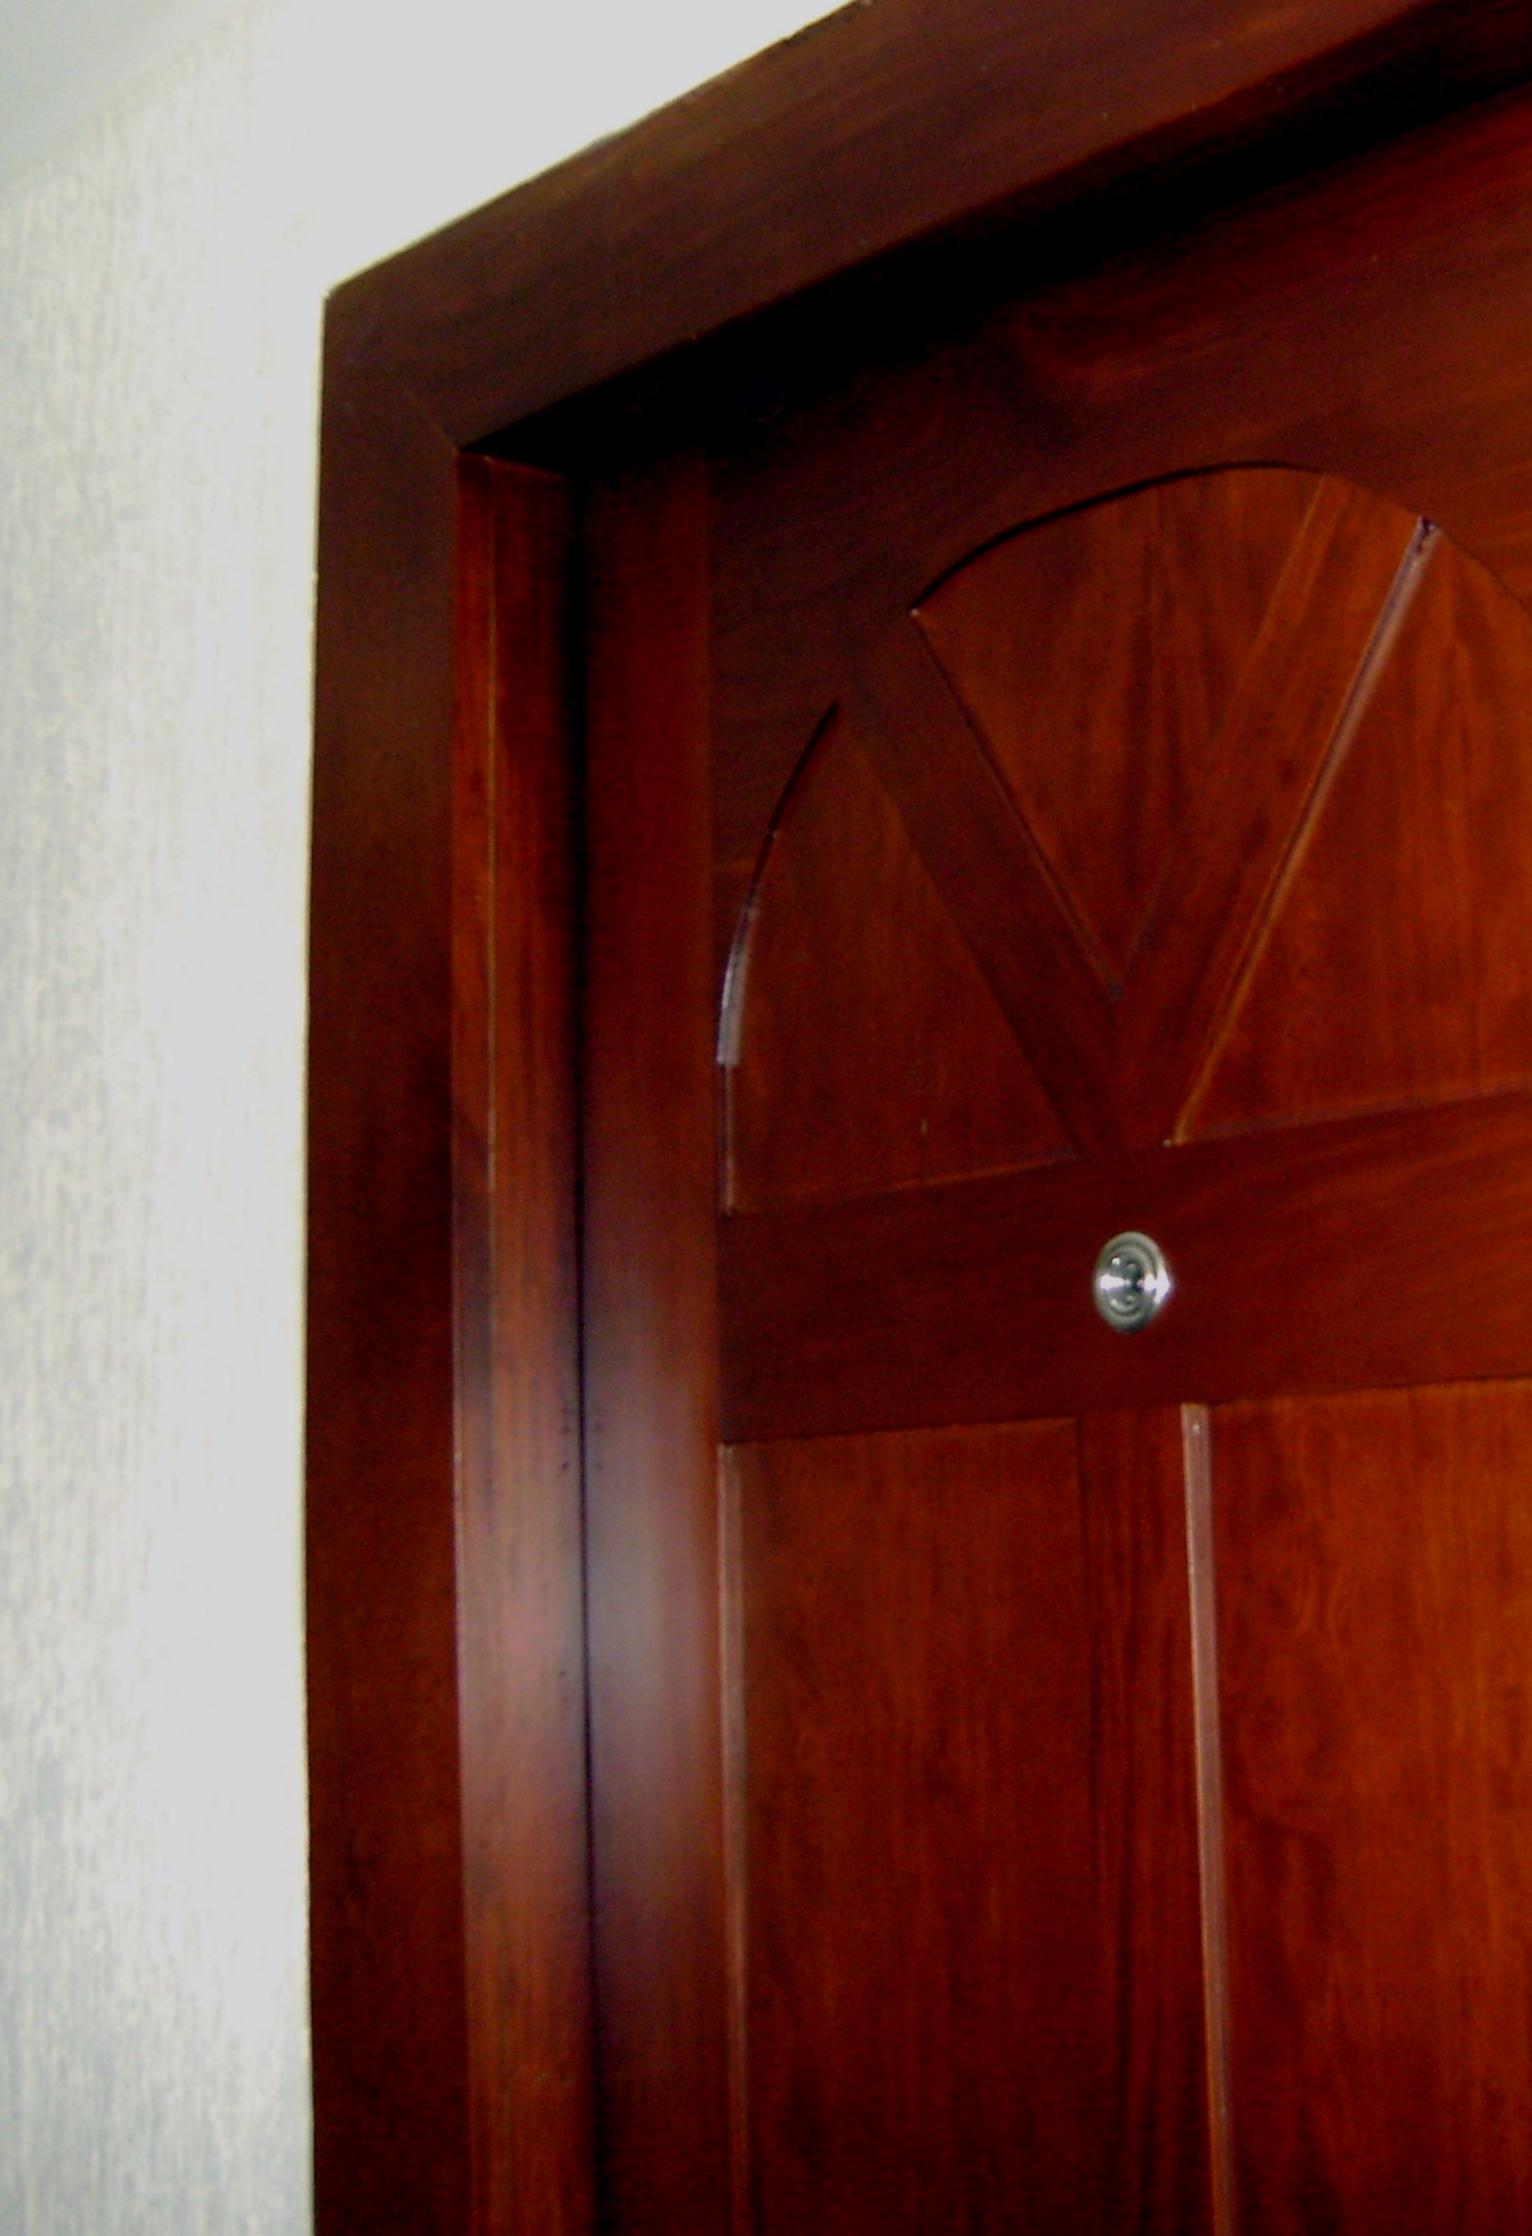 Puertas carpinter a talentos for Puertas de madera en concepcion